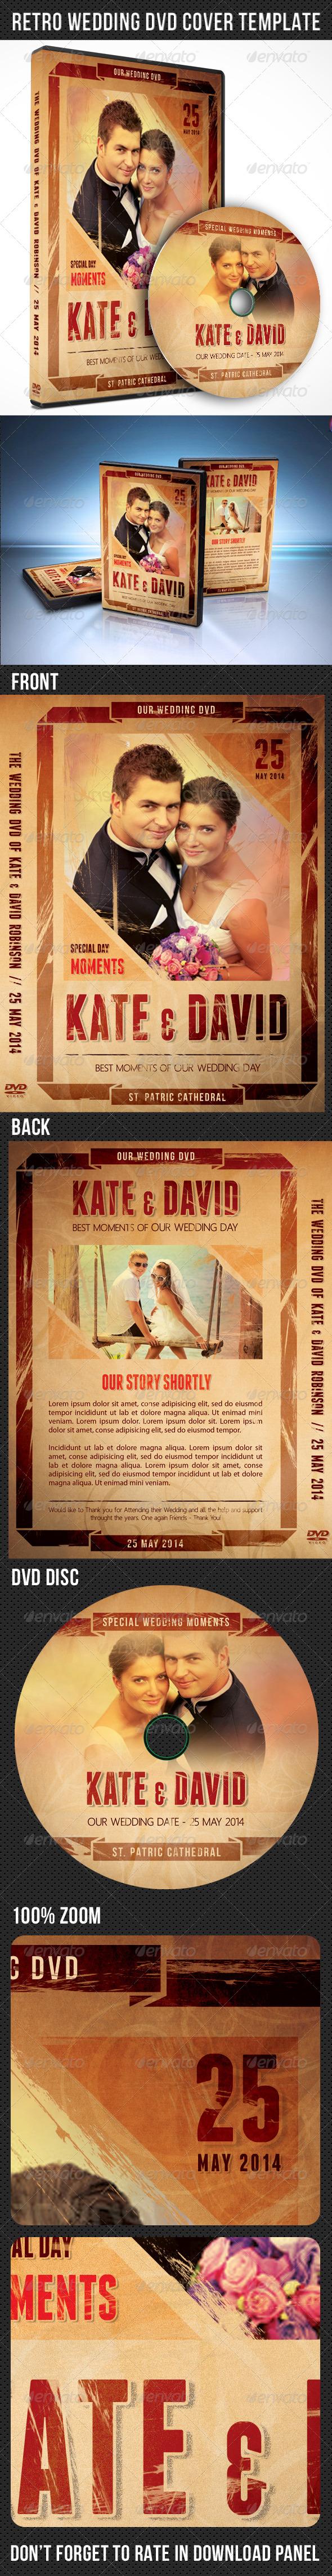 GraphicRiver Retro Wedding DVD Cover Template 7450625